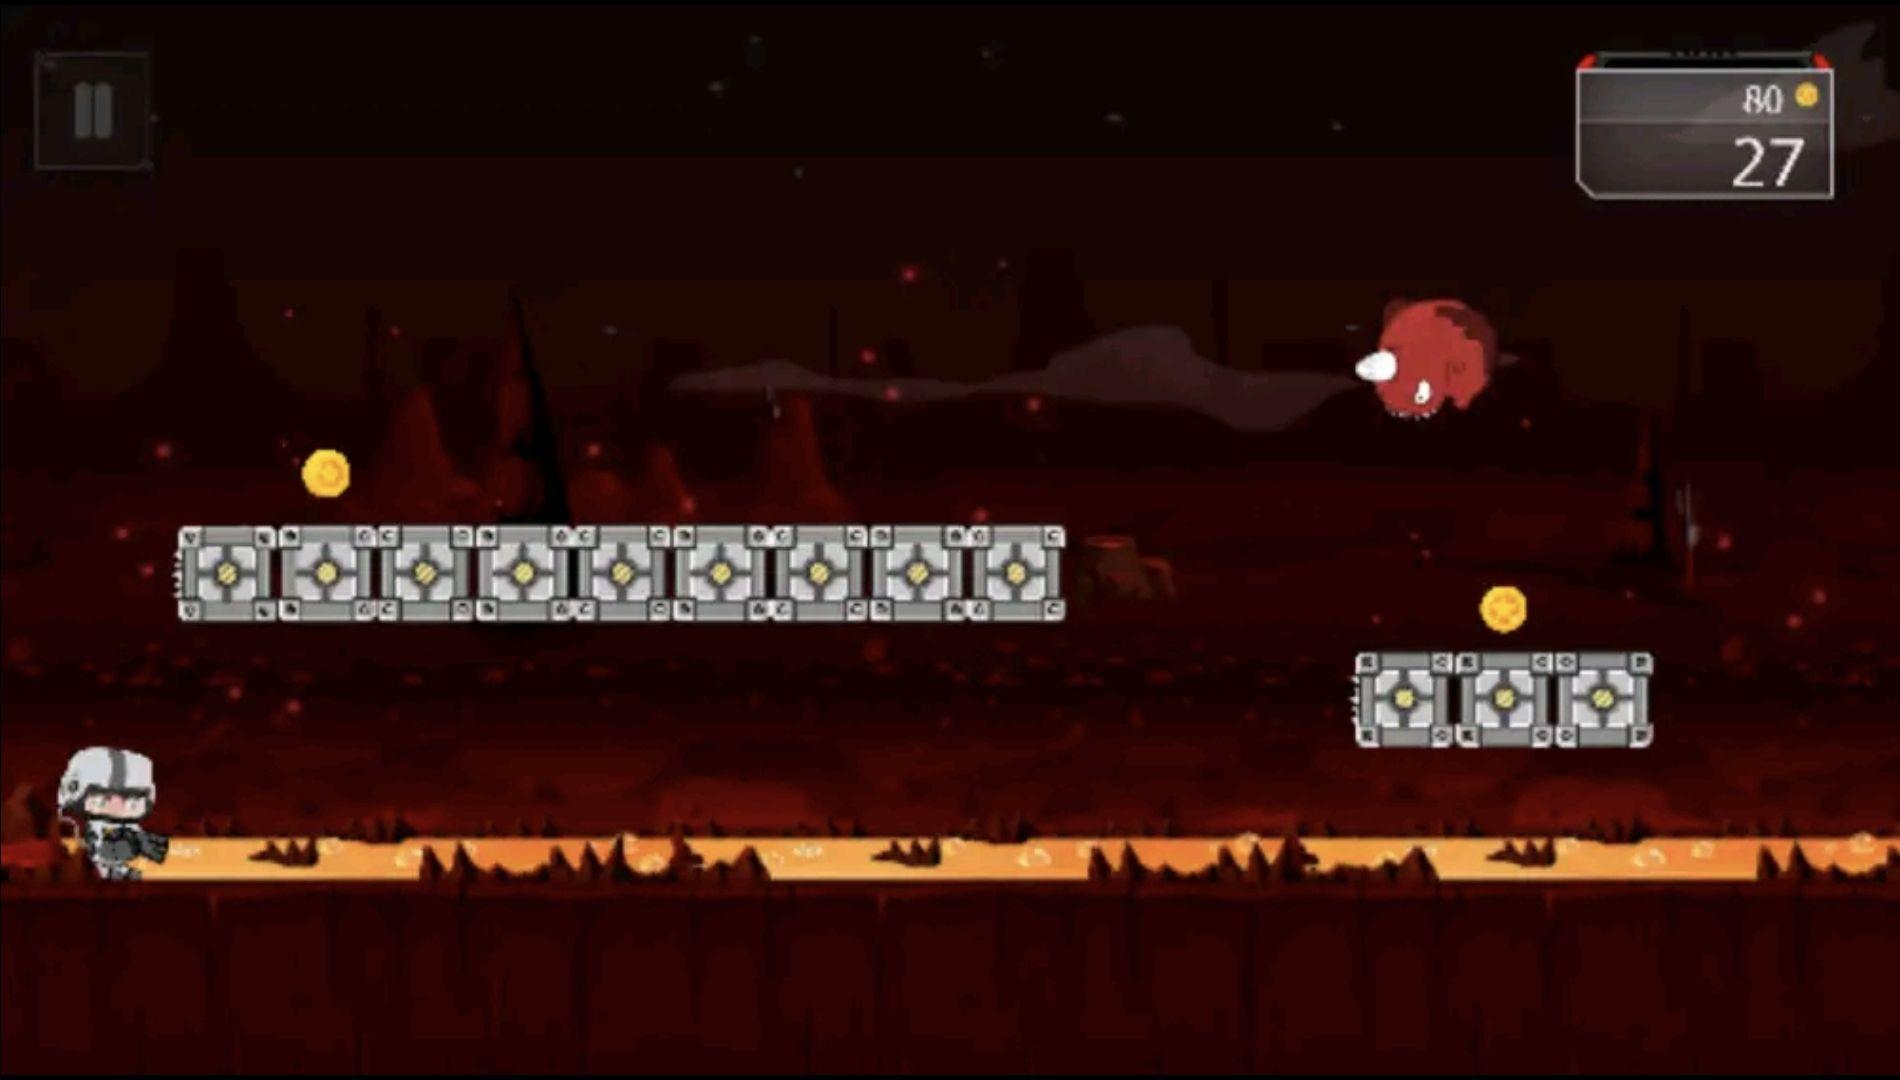 Gratis Android game: Mars jump